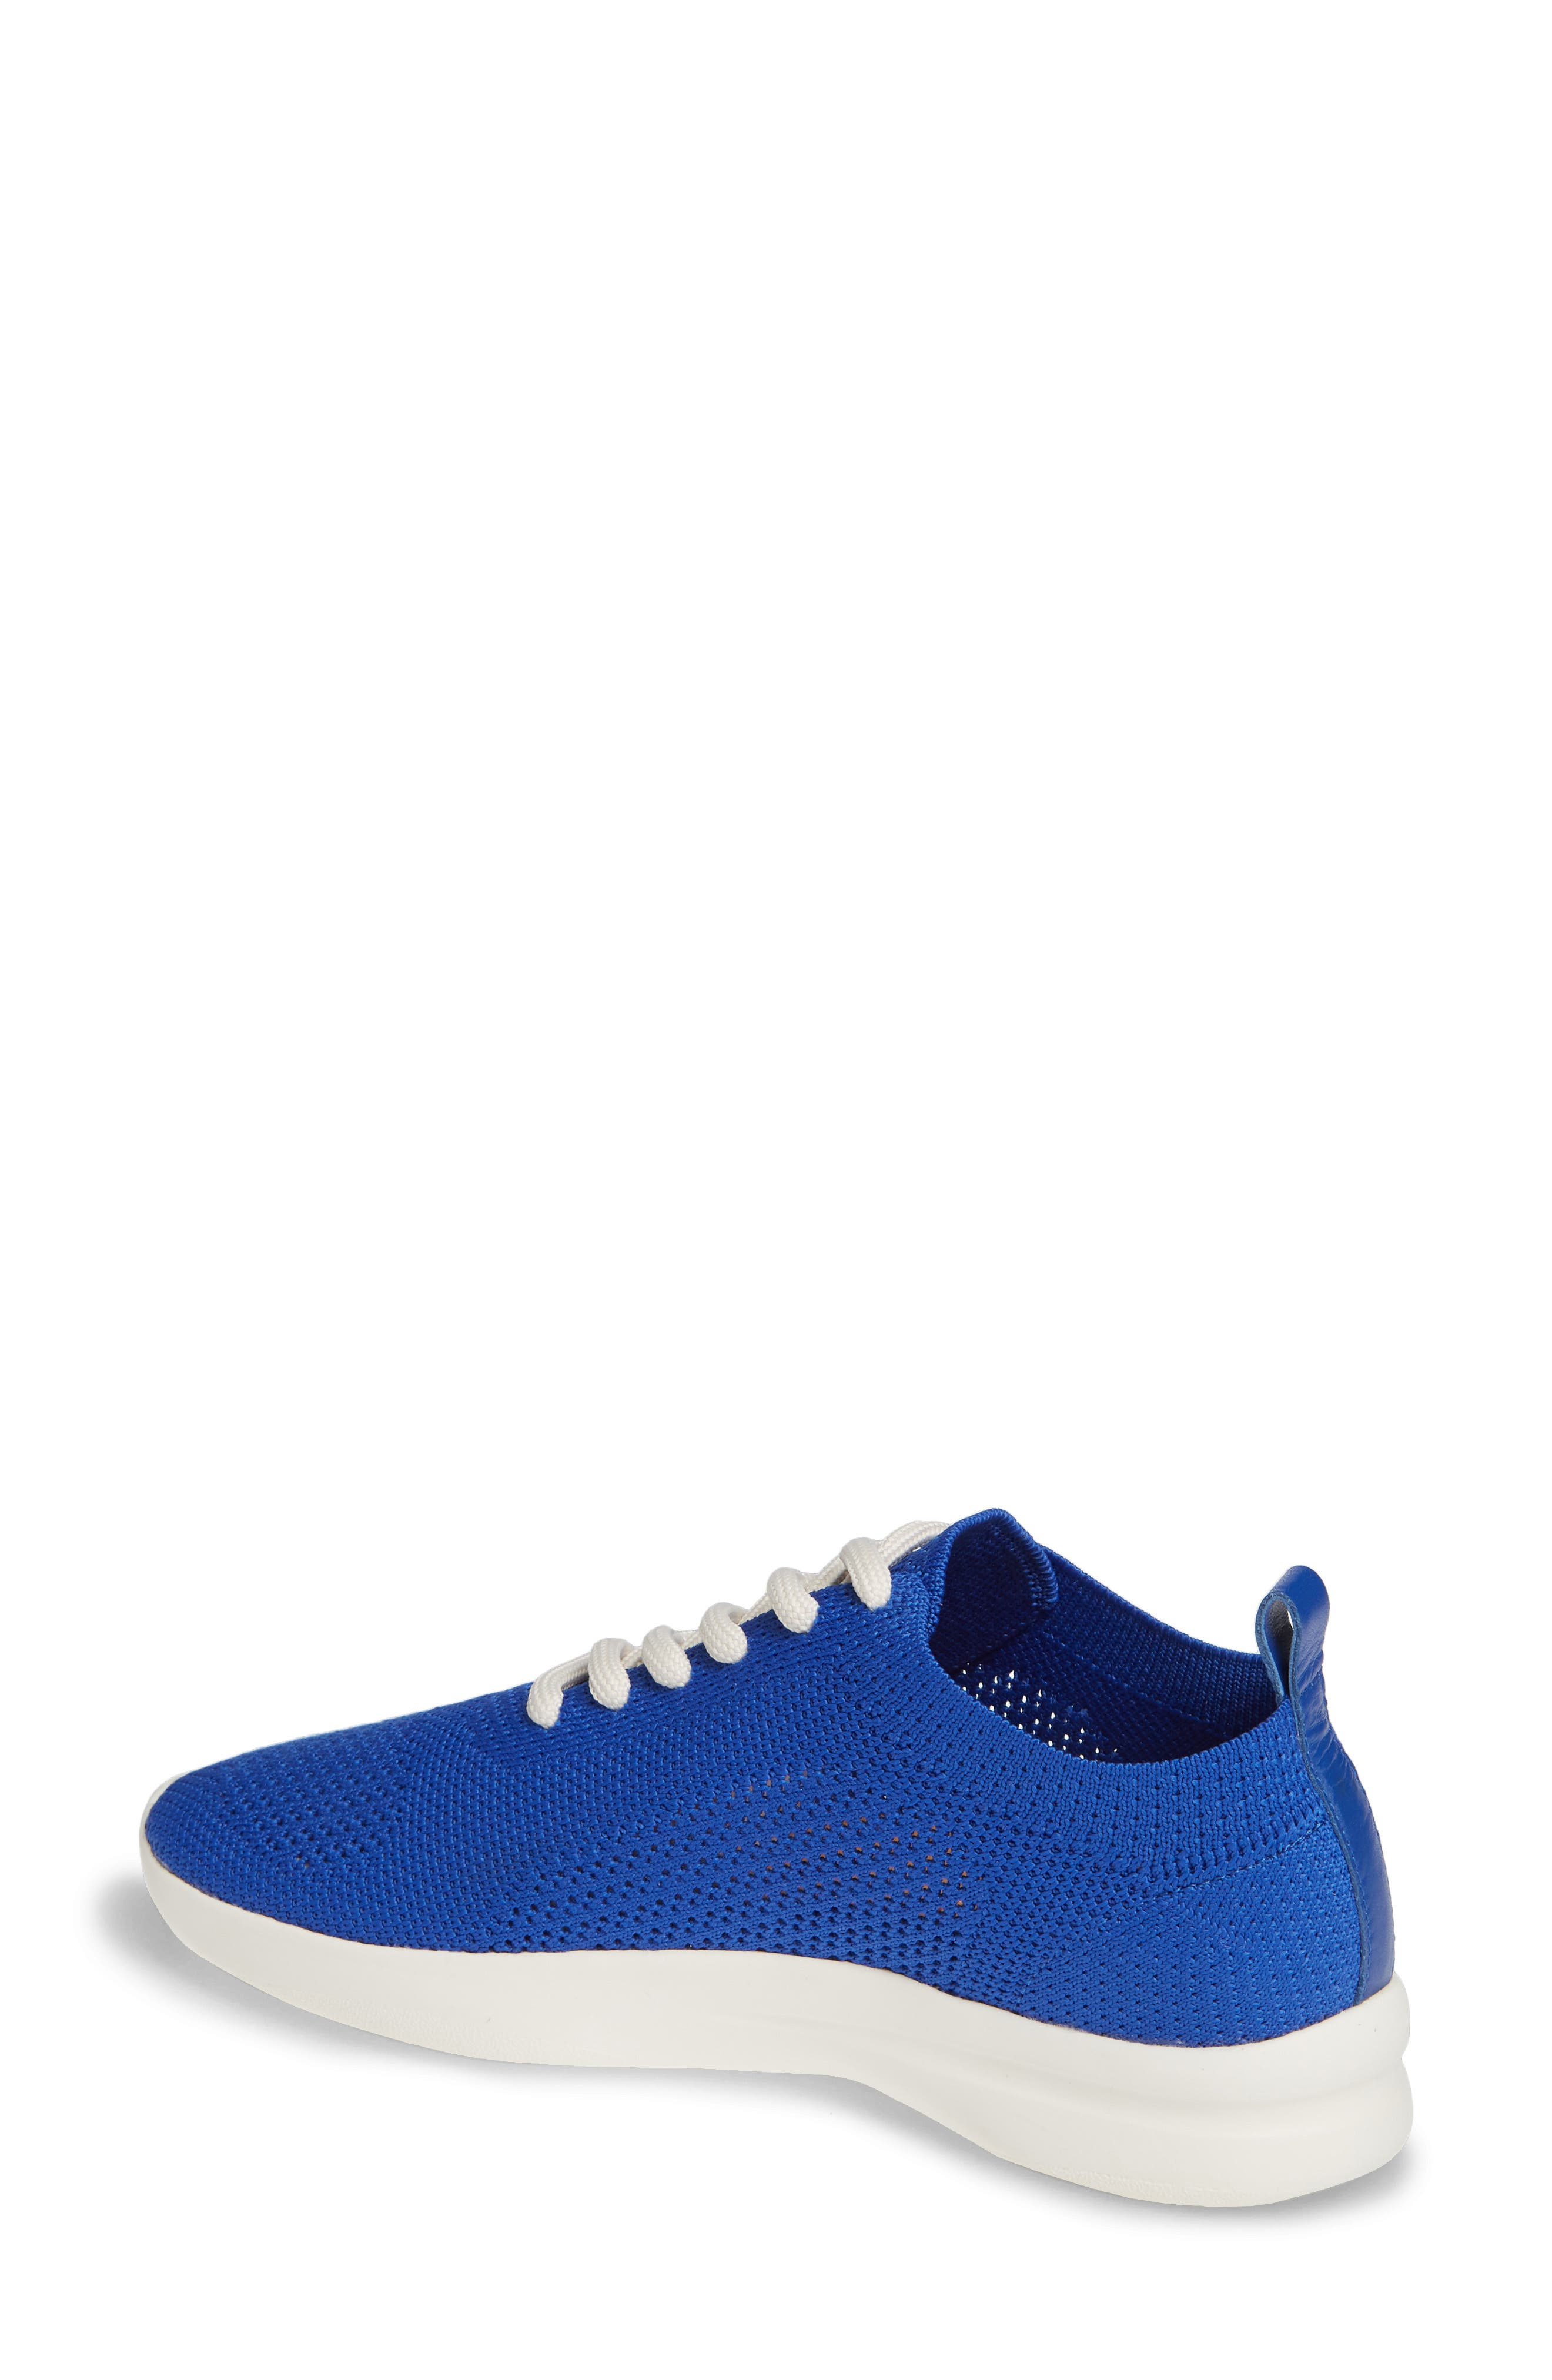 Randee Sneaker,                             Alternate thumbnail 2, color,                             Blue Fabric